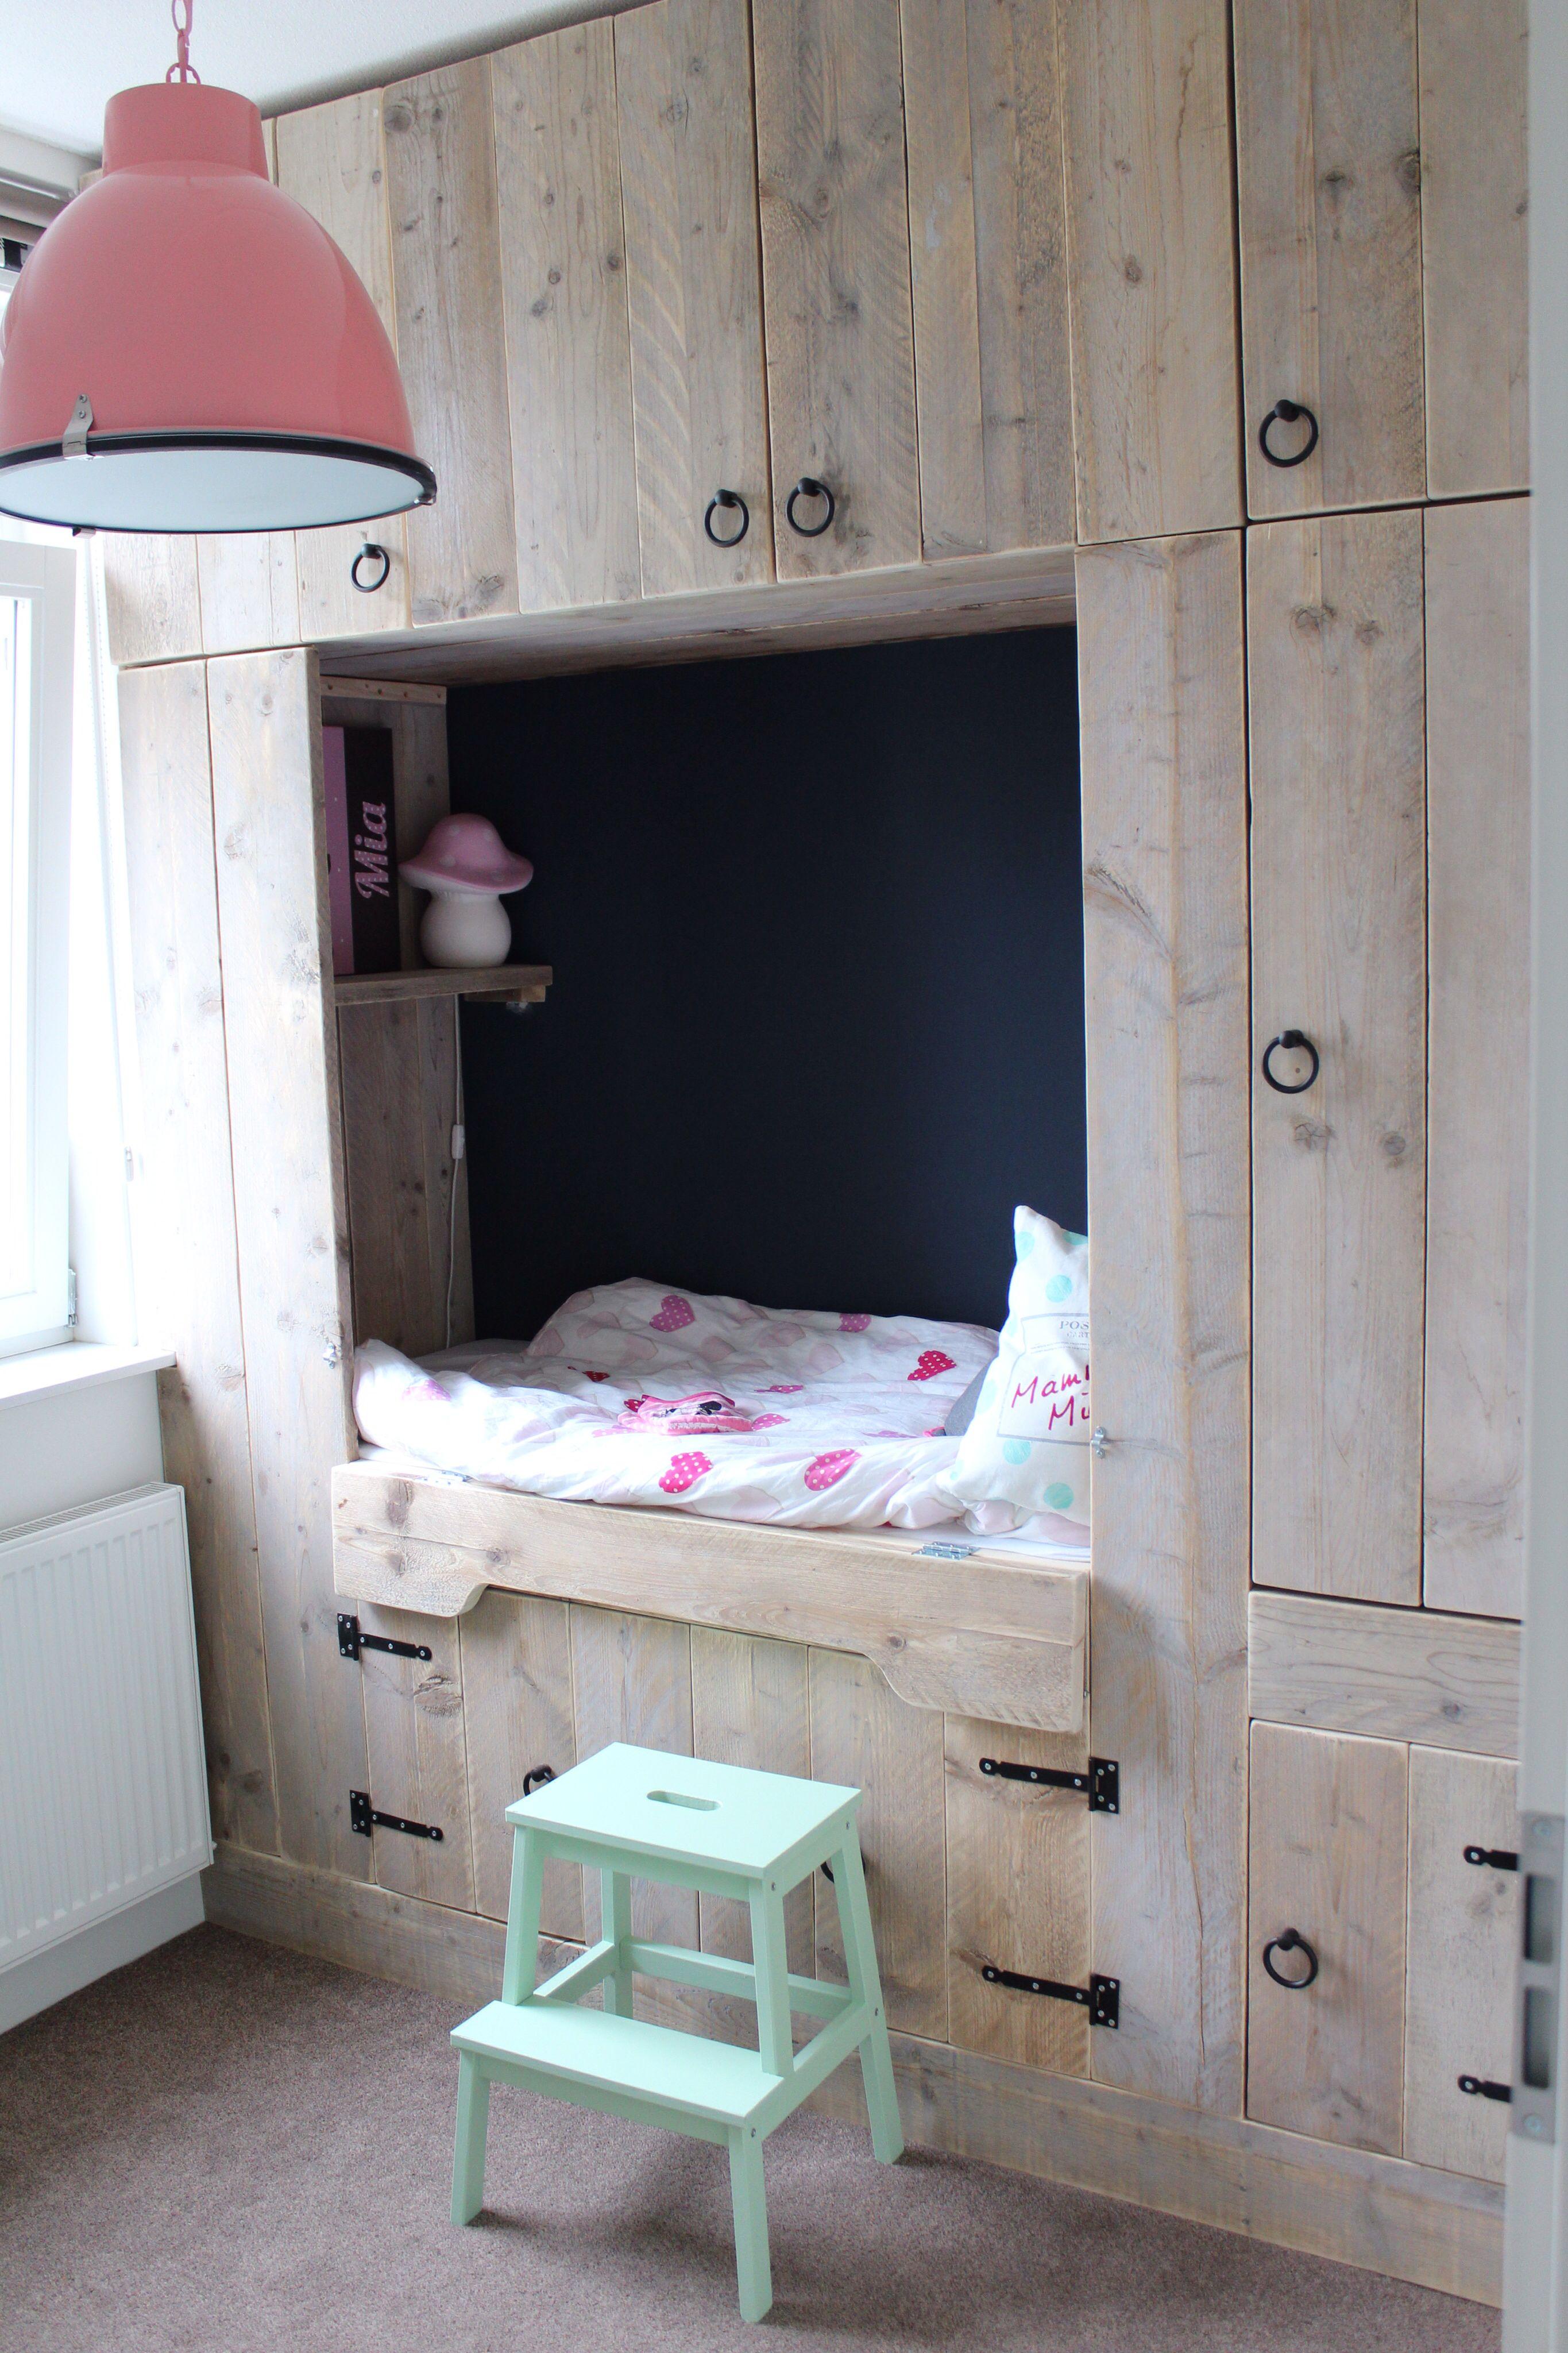 Bedstee steigerhout zelf gemaakt pinterest kinderkamer slaapkamer en kinderbed - Stapelbed kleine kamer ...